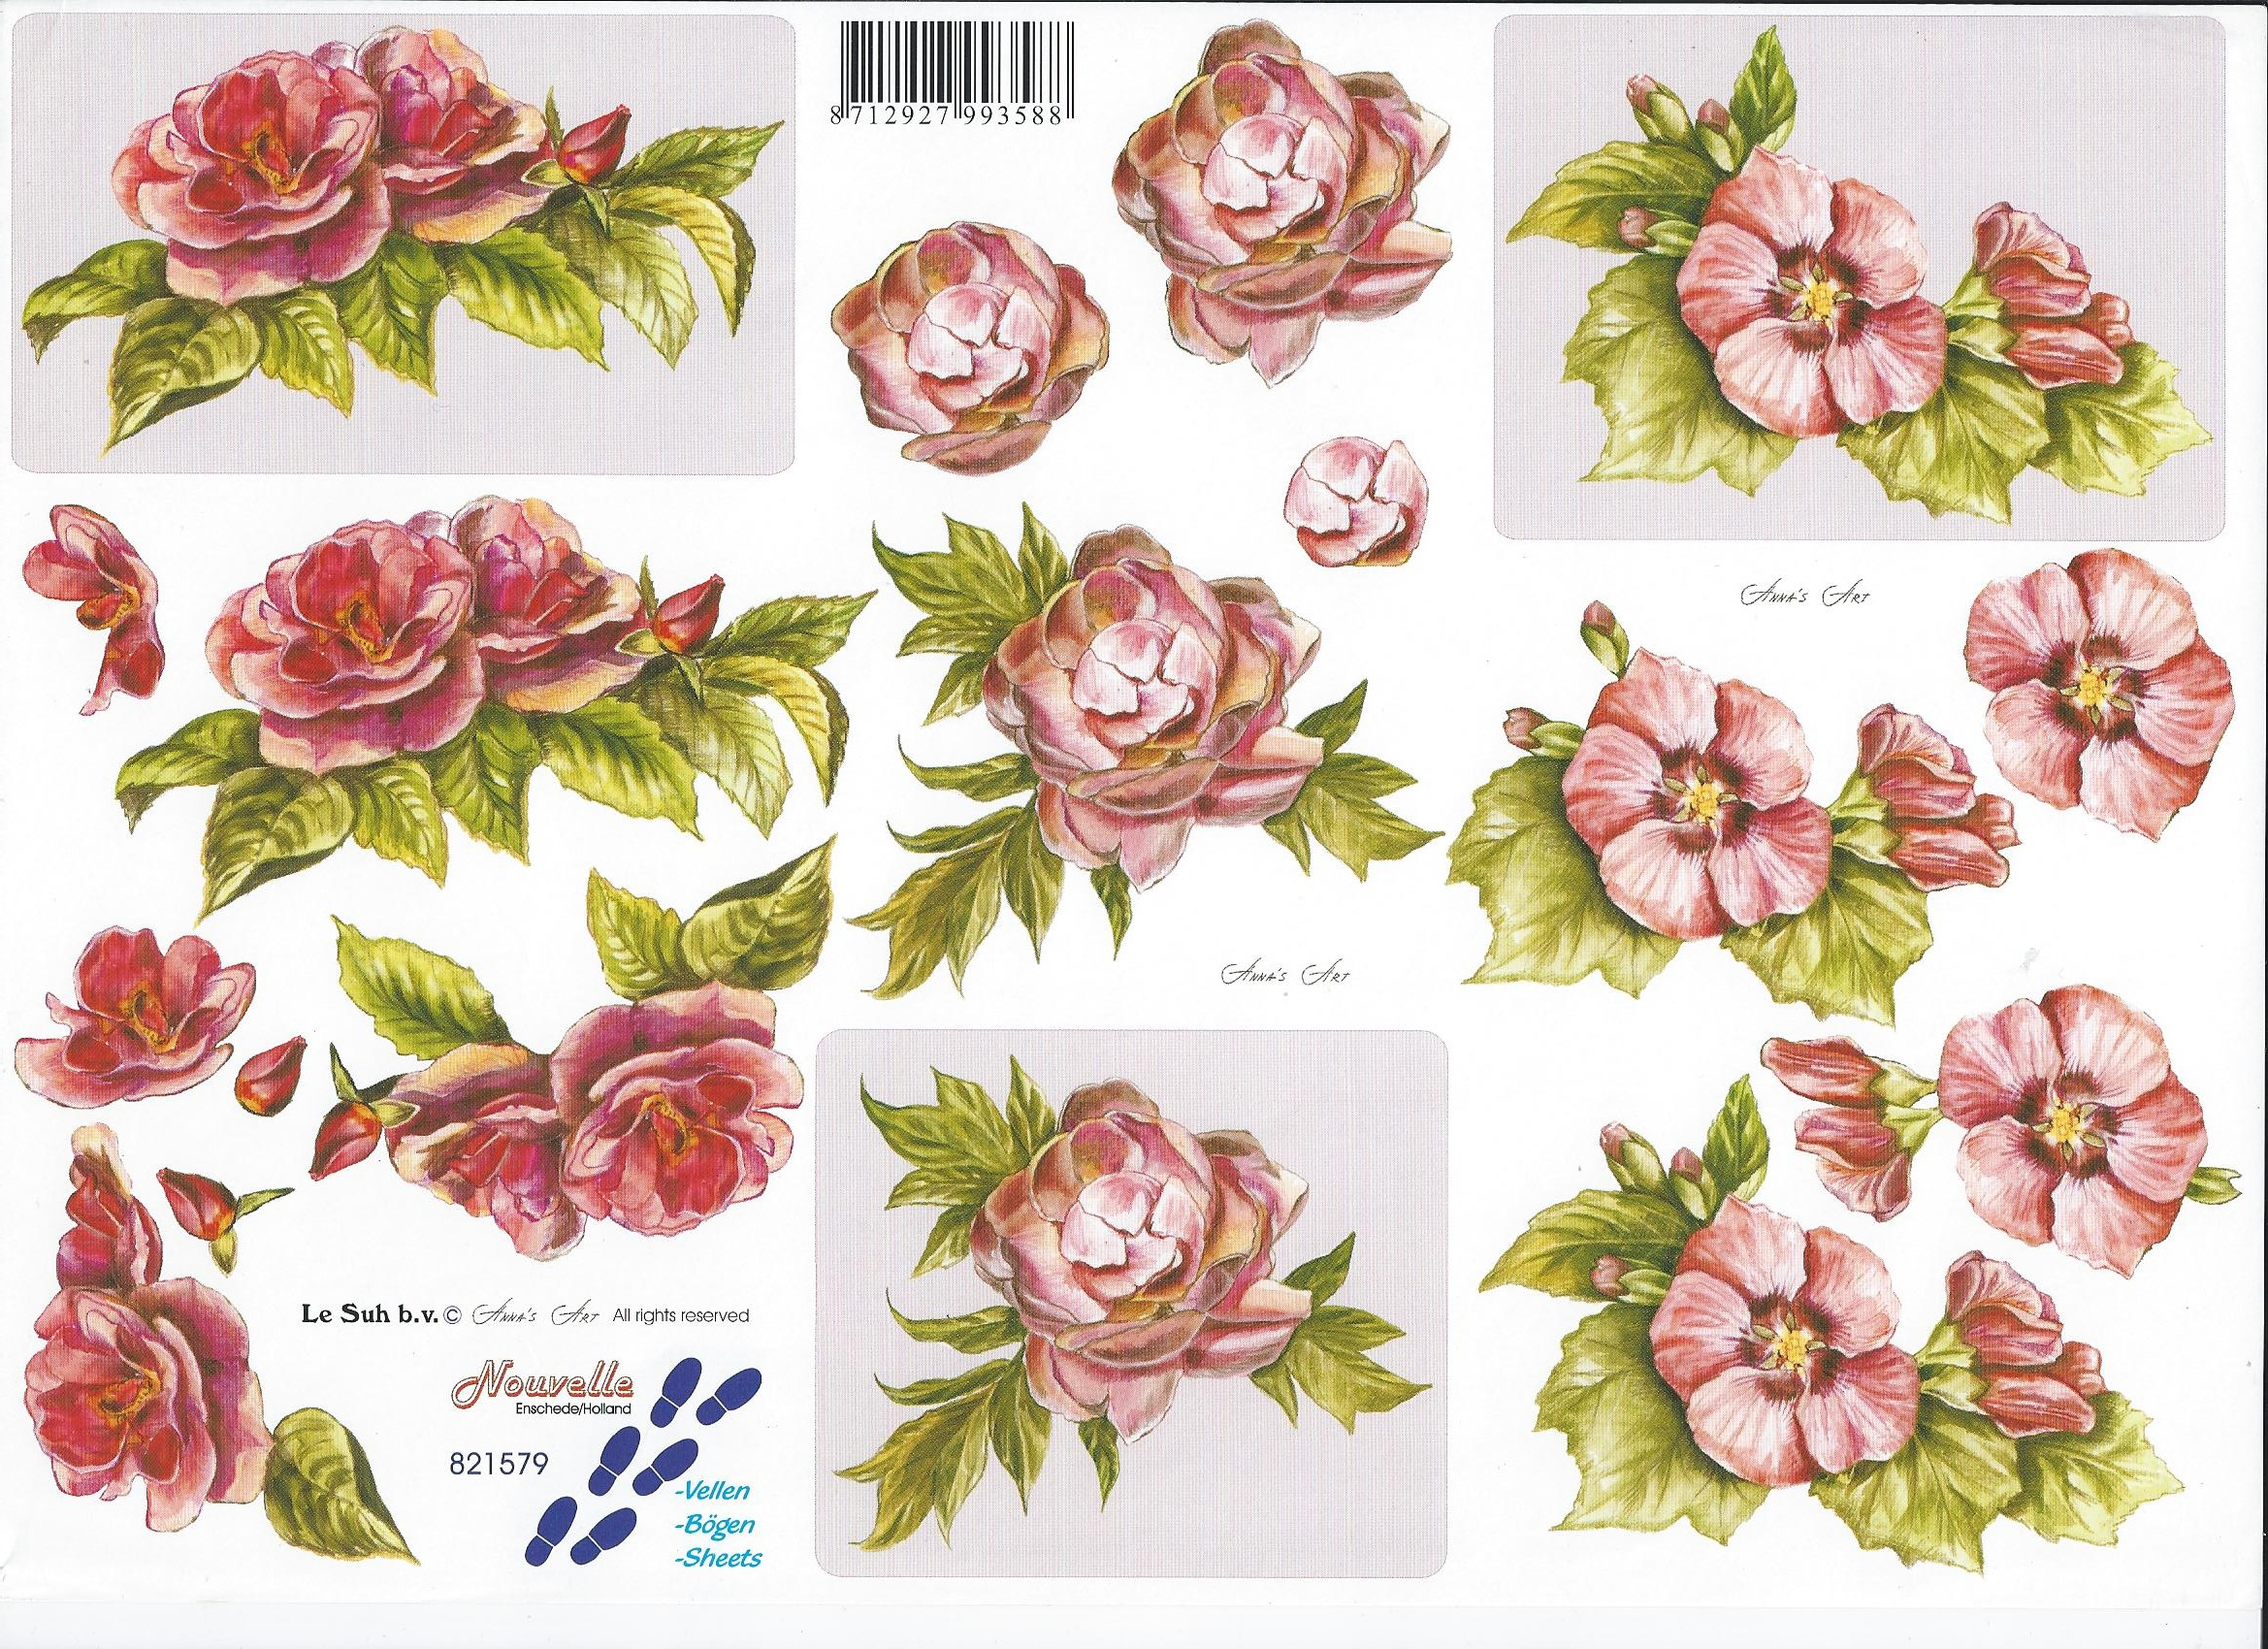 Célèbre Le Suh 3d decoupage - old style roses | Virgo CraftsVirgo Crafts YW09